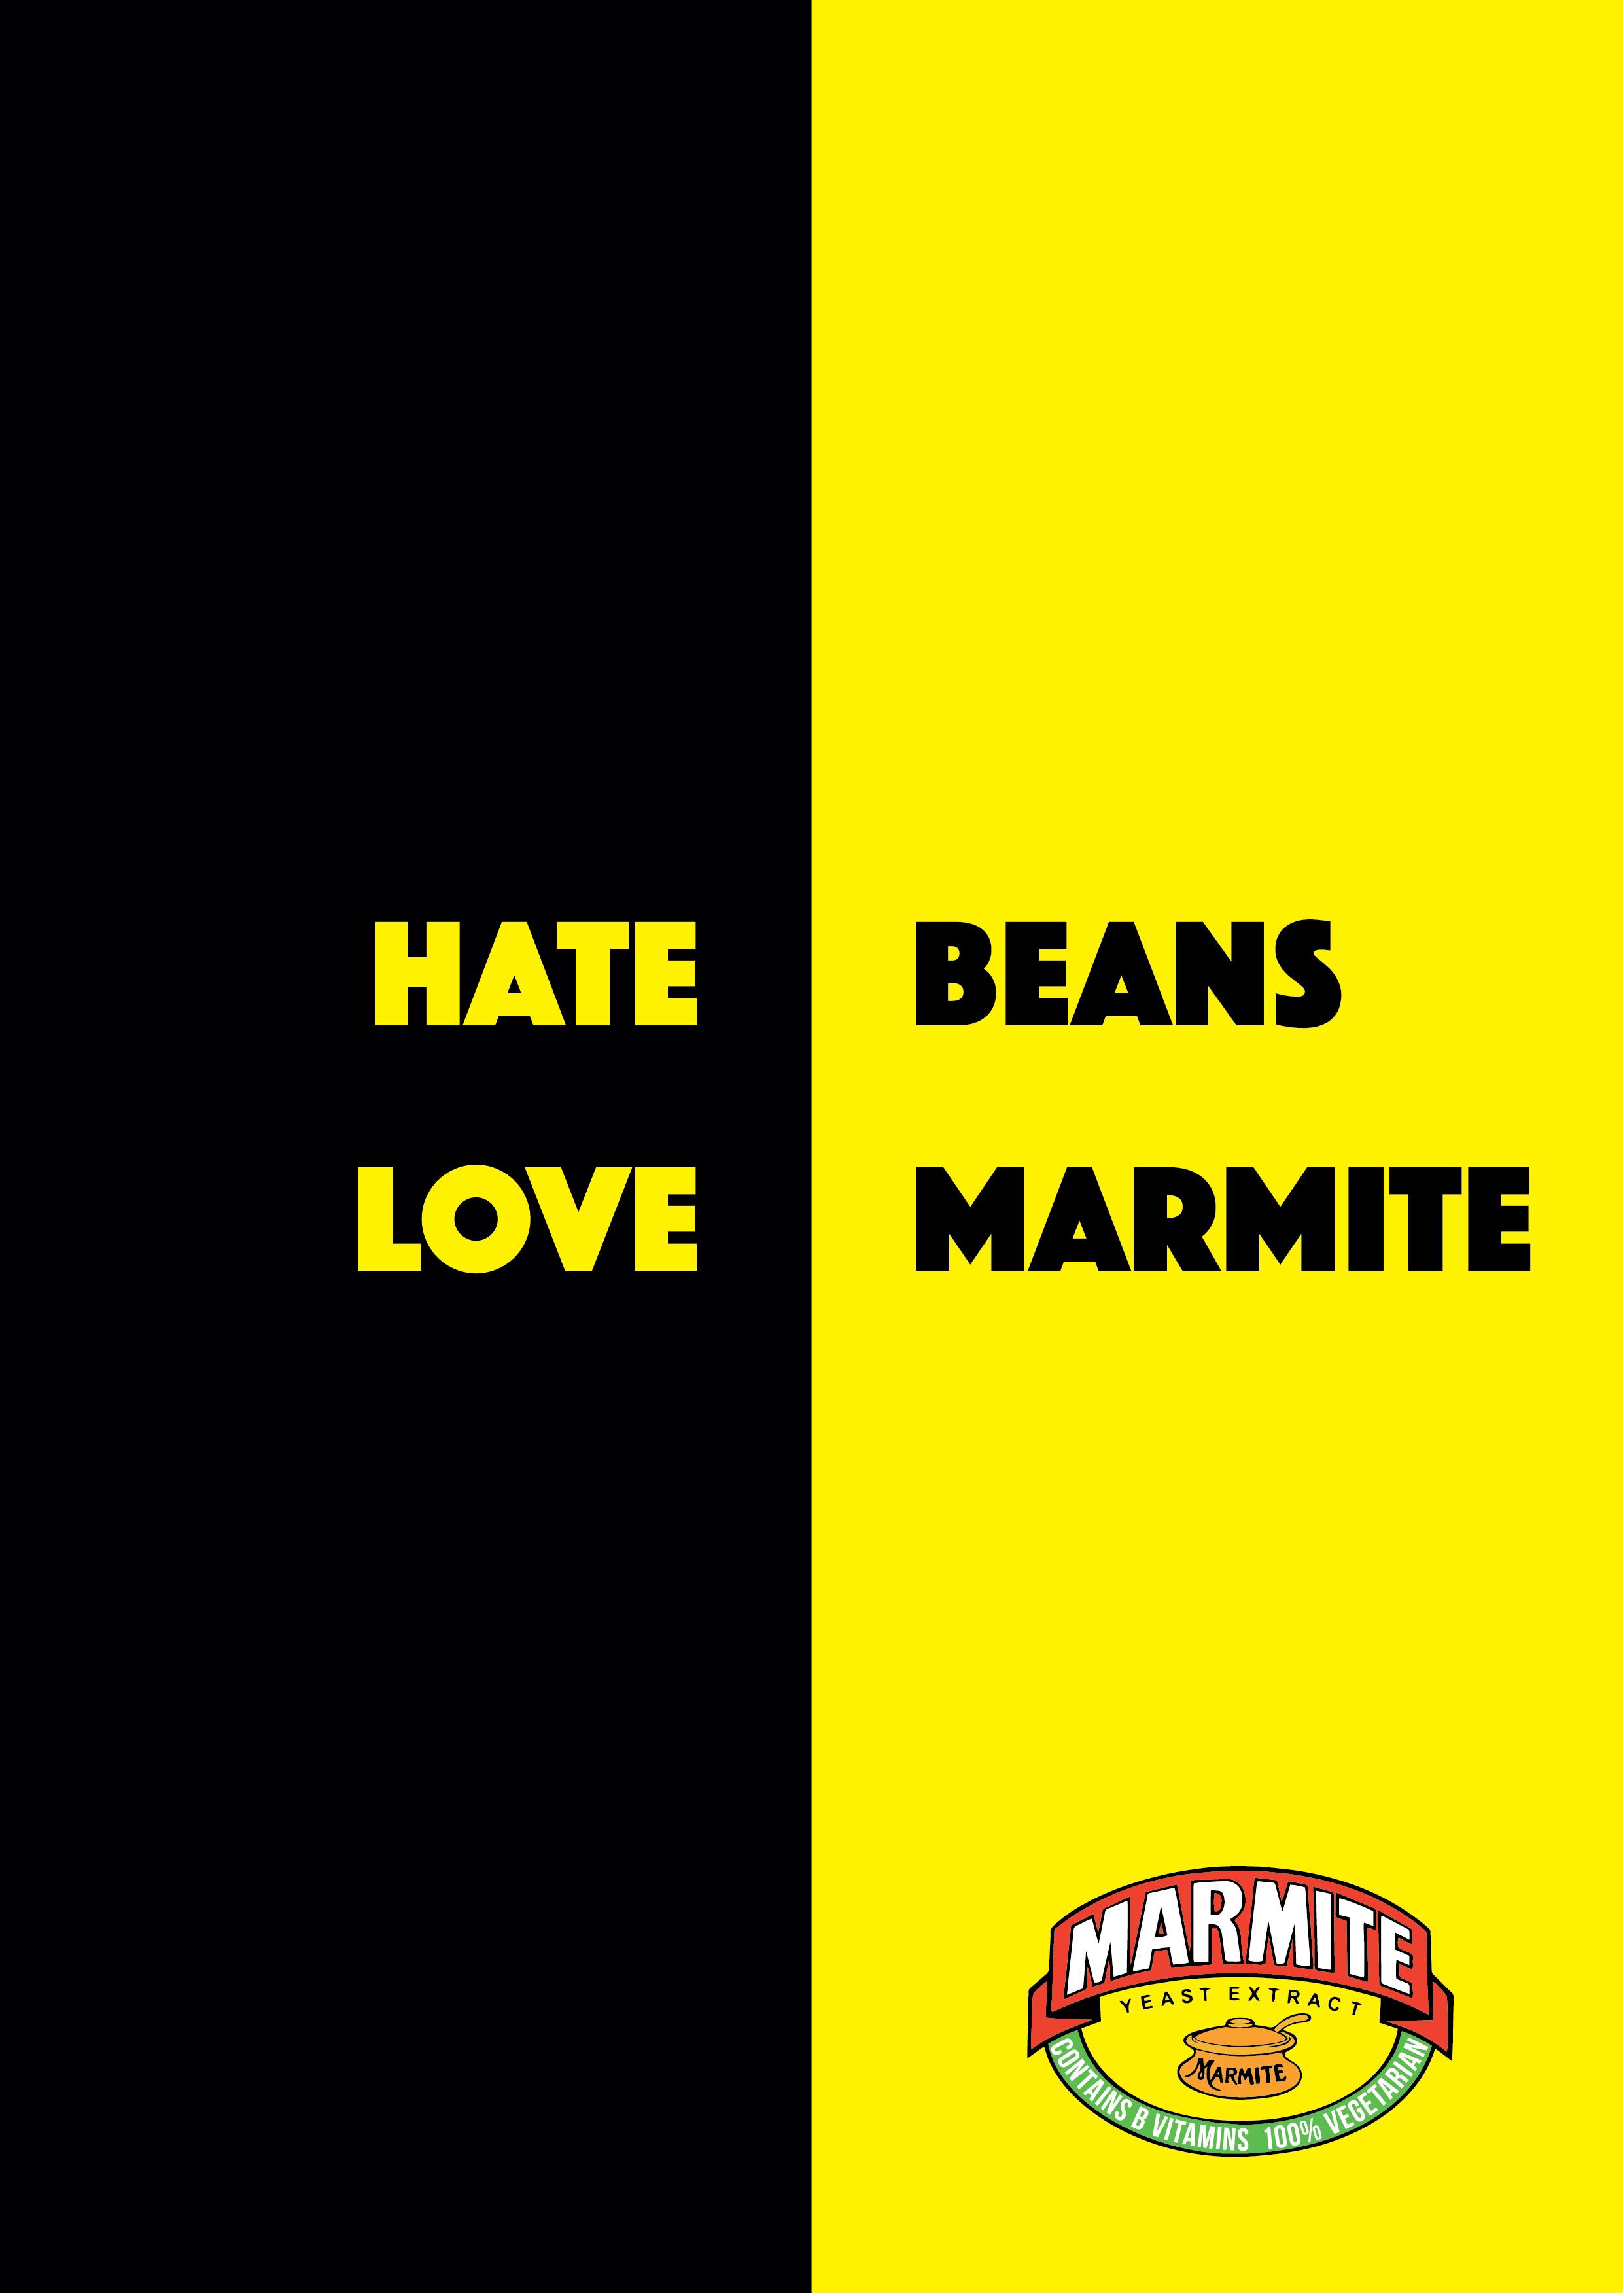 Marmate-06.png